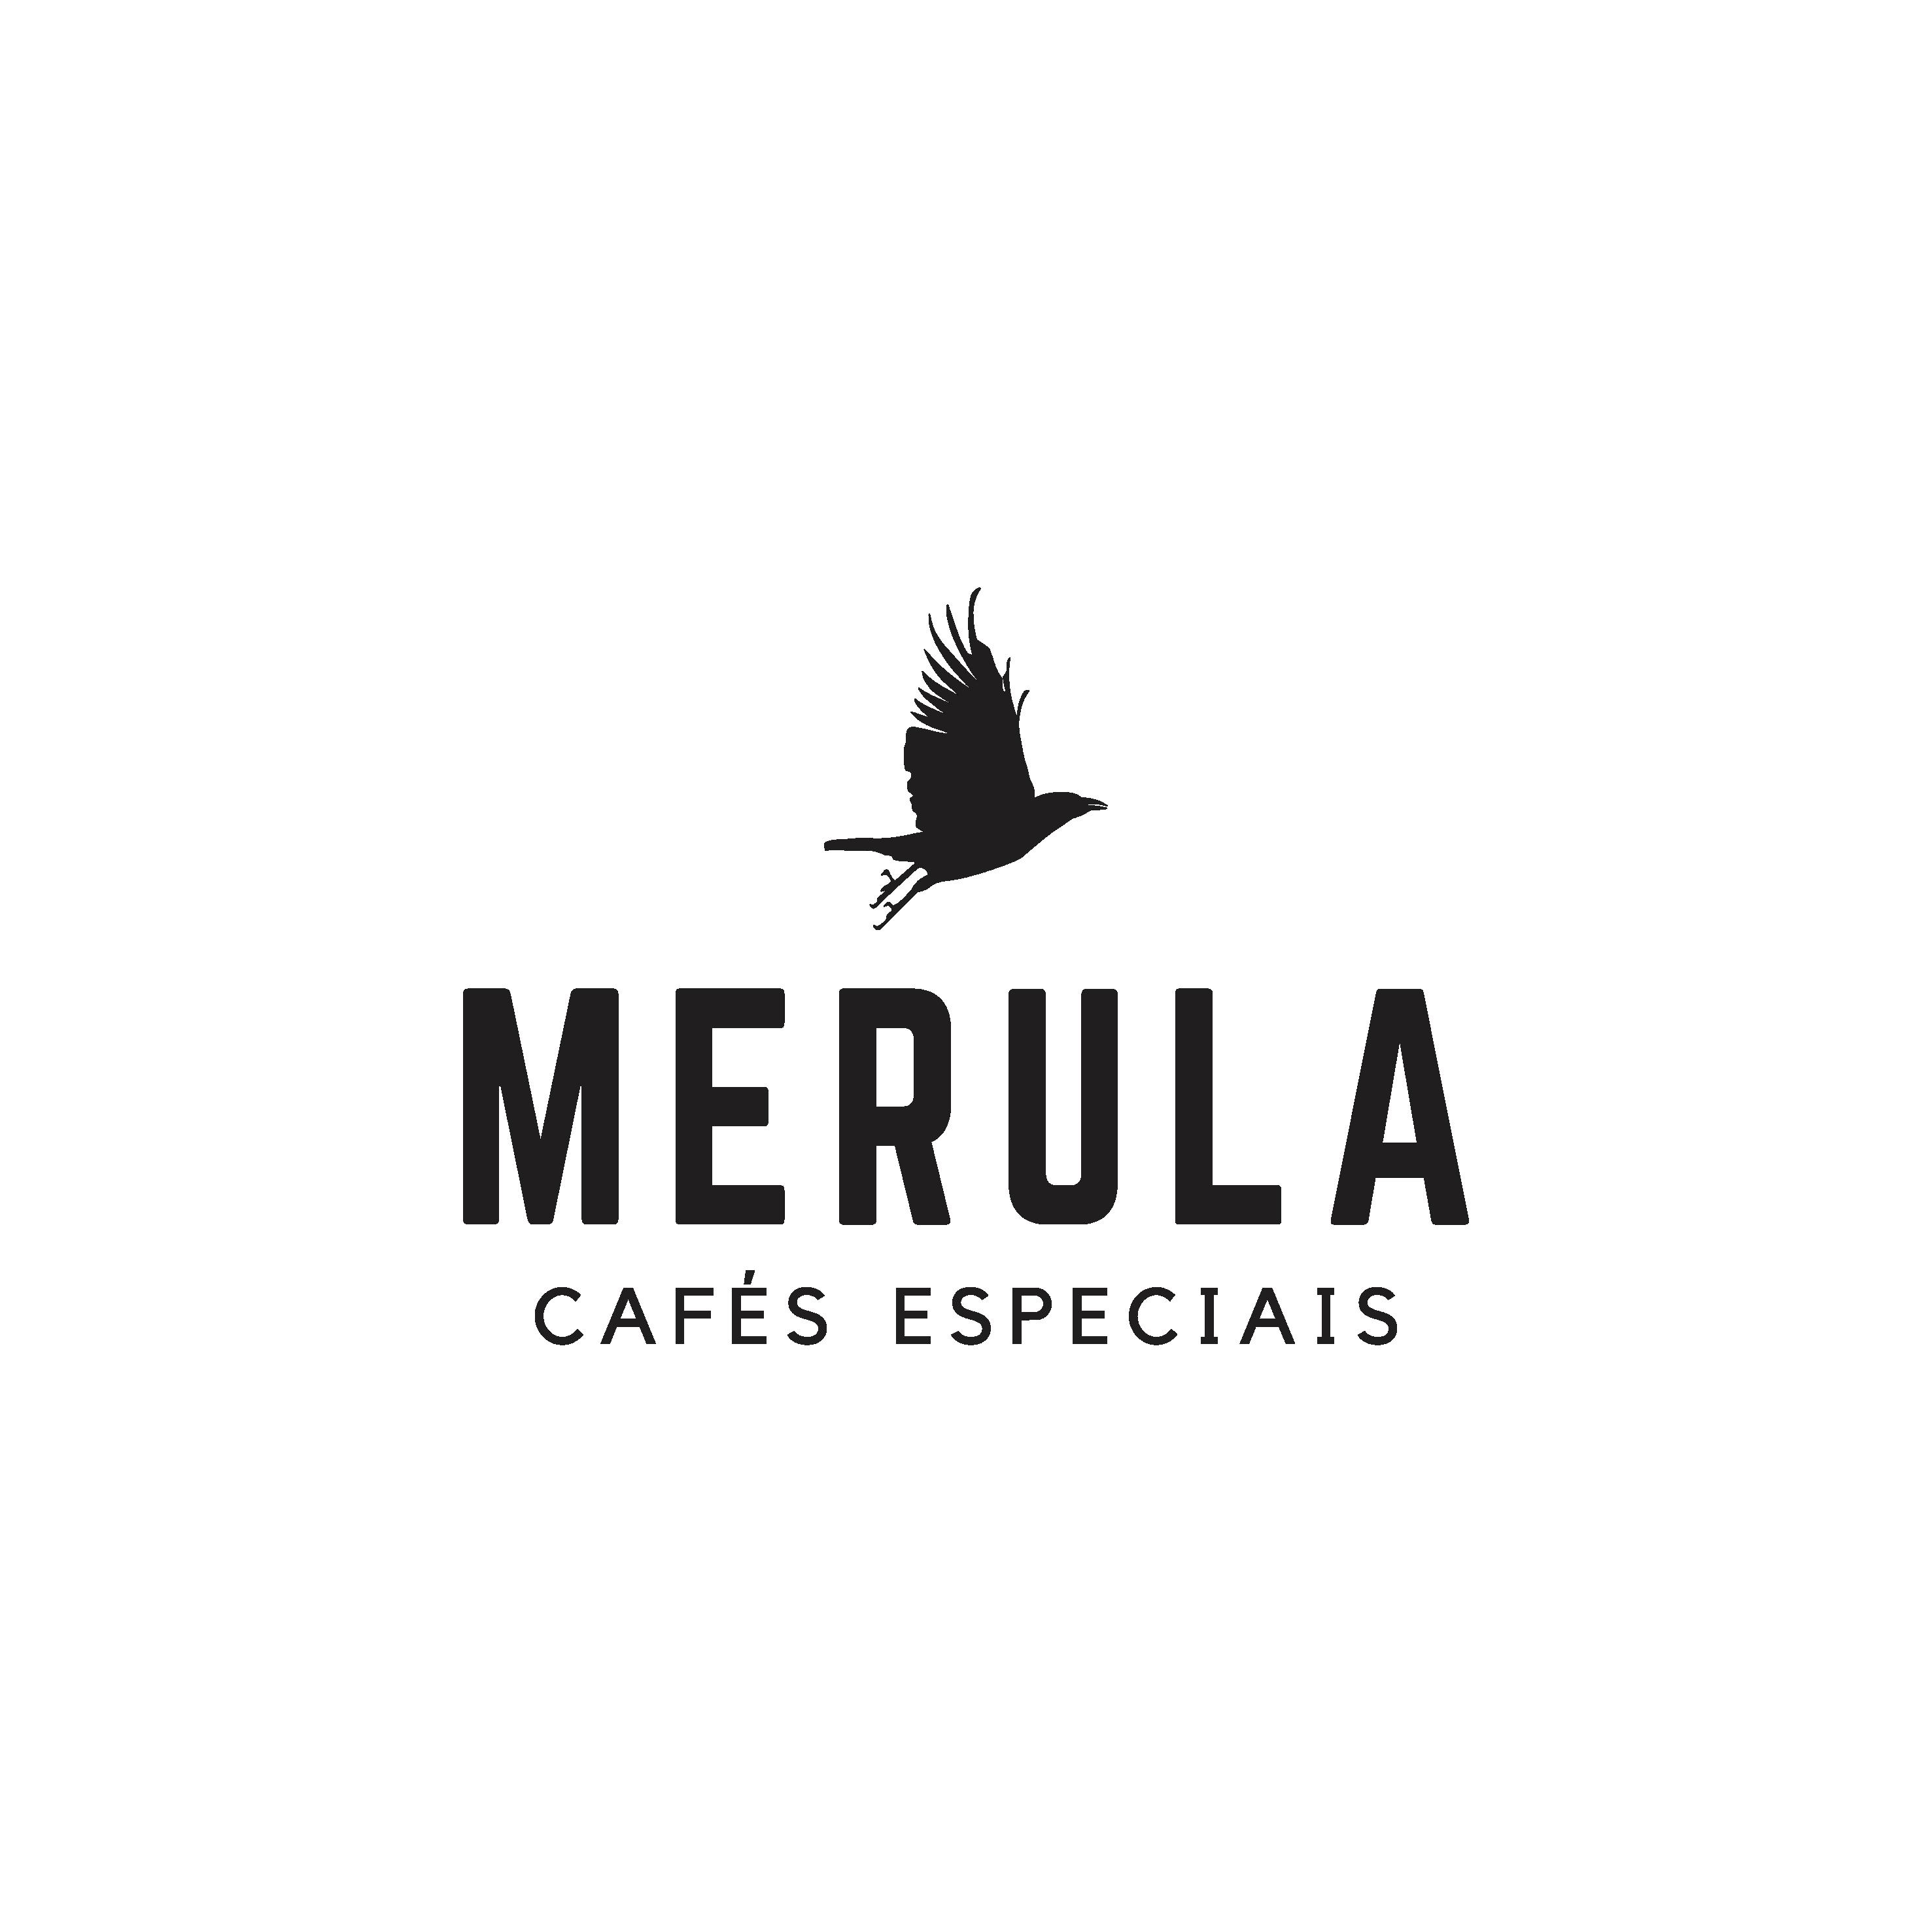 Merula Cafés Especiais